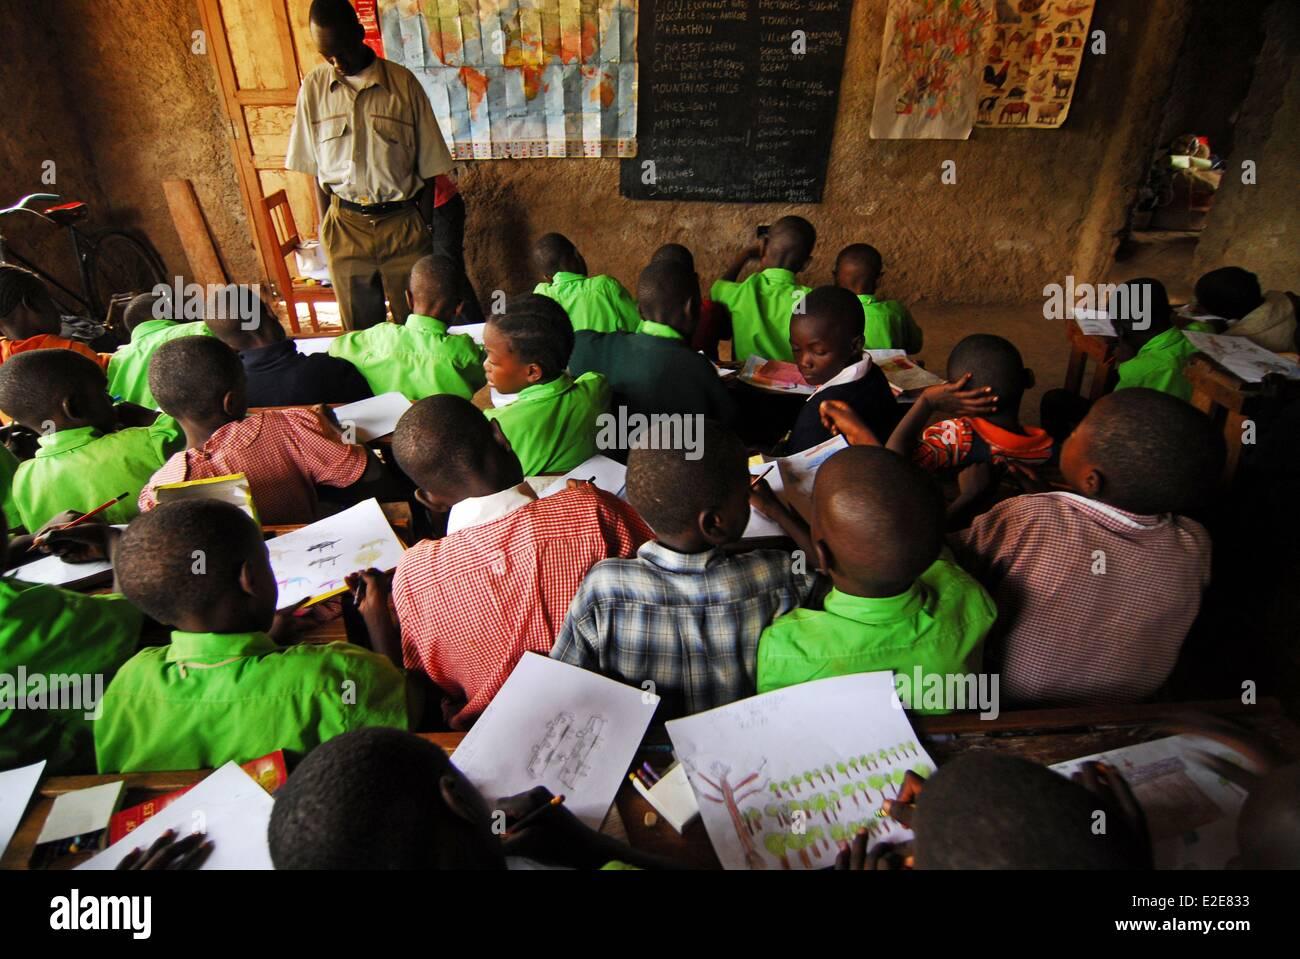 Kenya, Kakamega, schoolchildren drawing in classroom - Stock Image